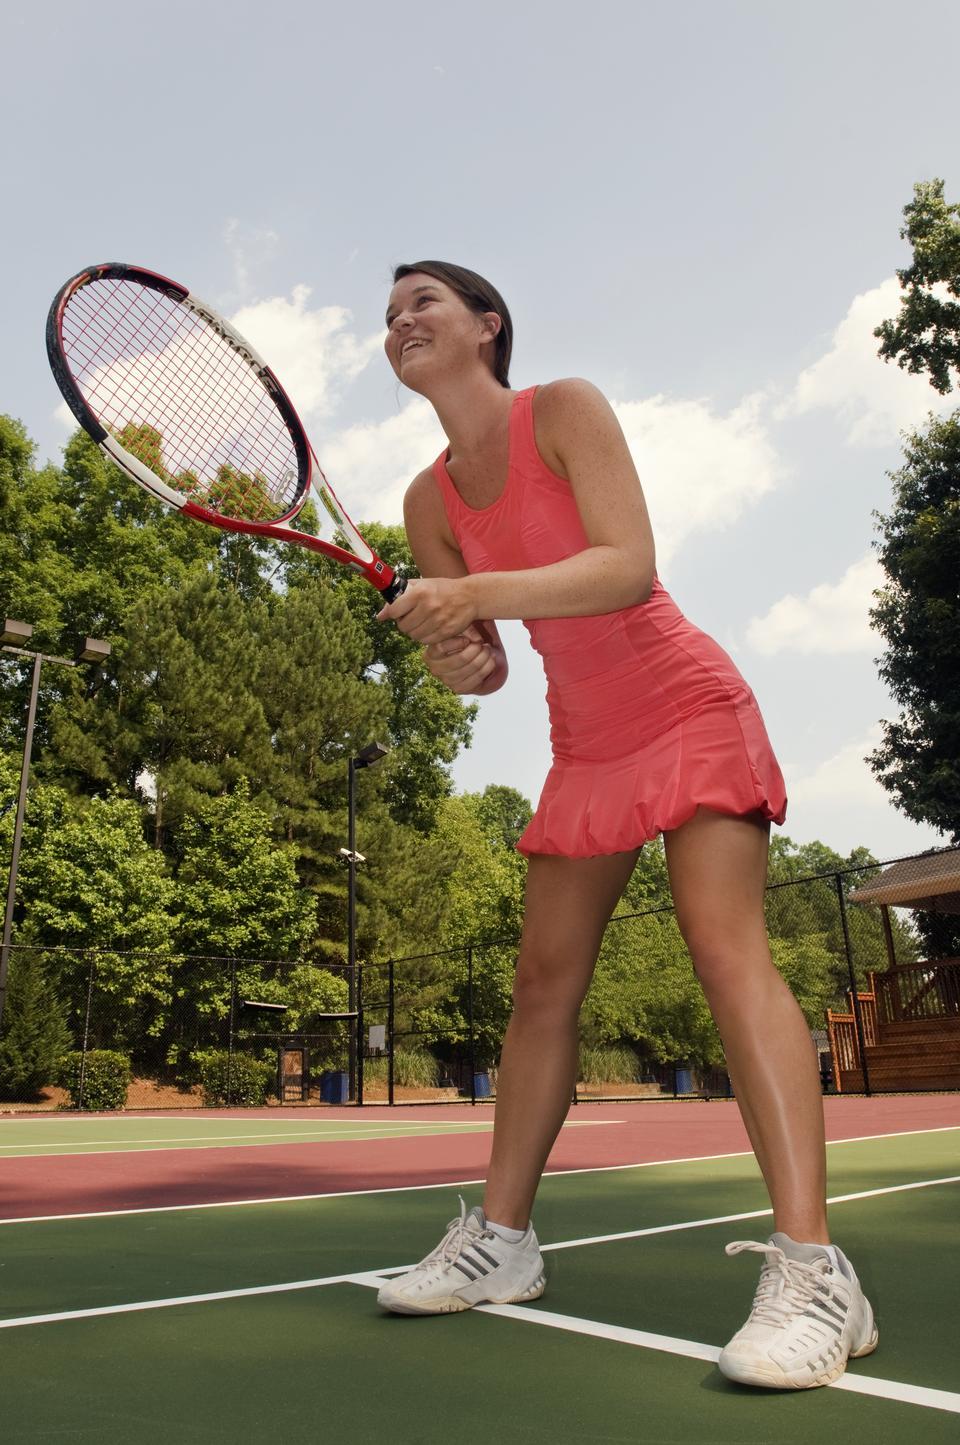 Free A Woman Playing Tennis